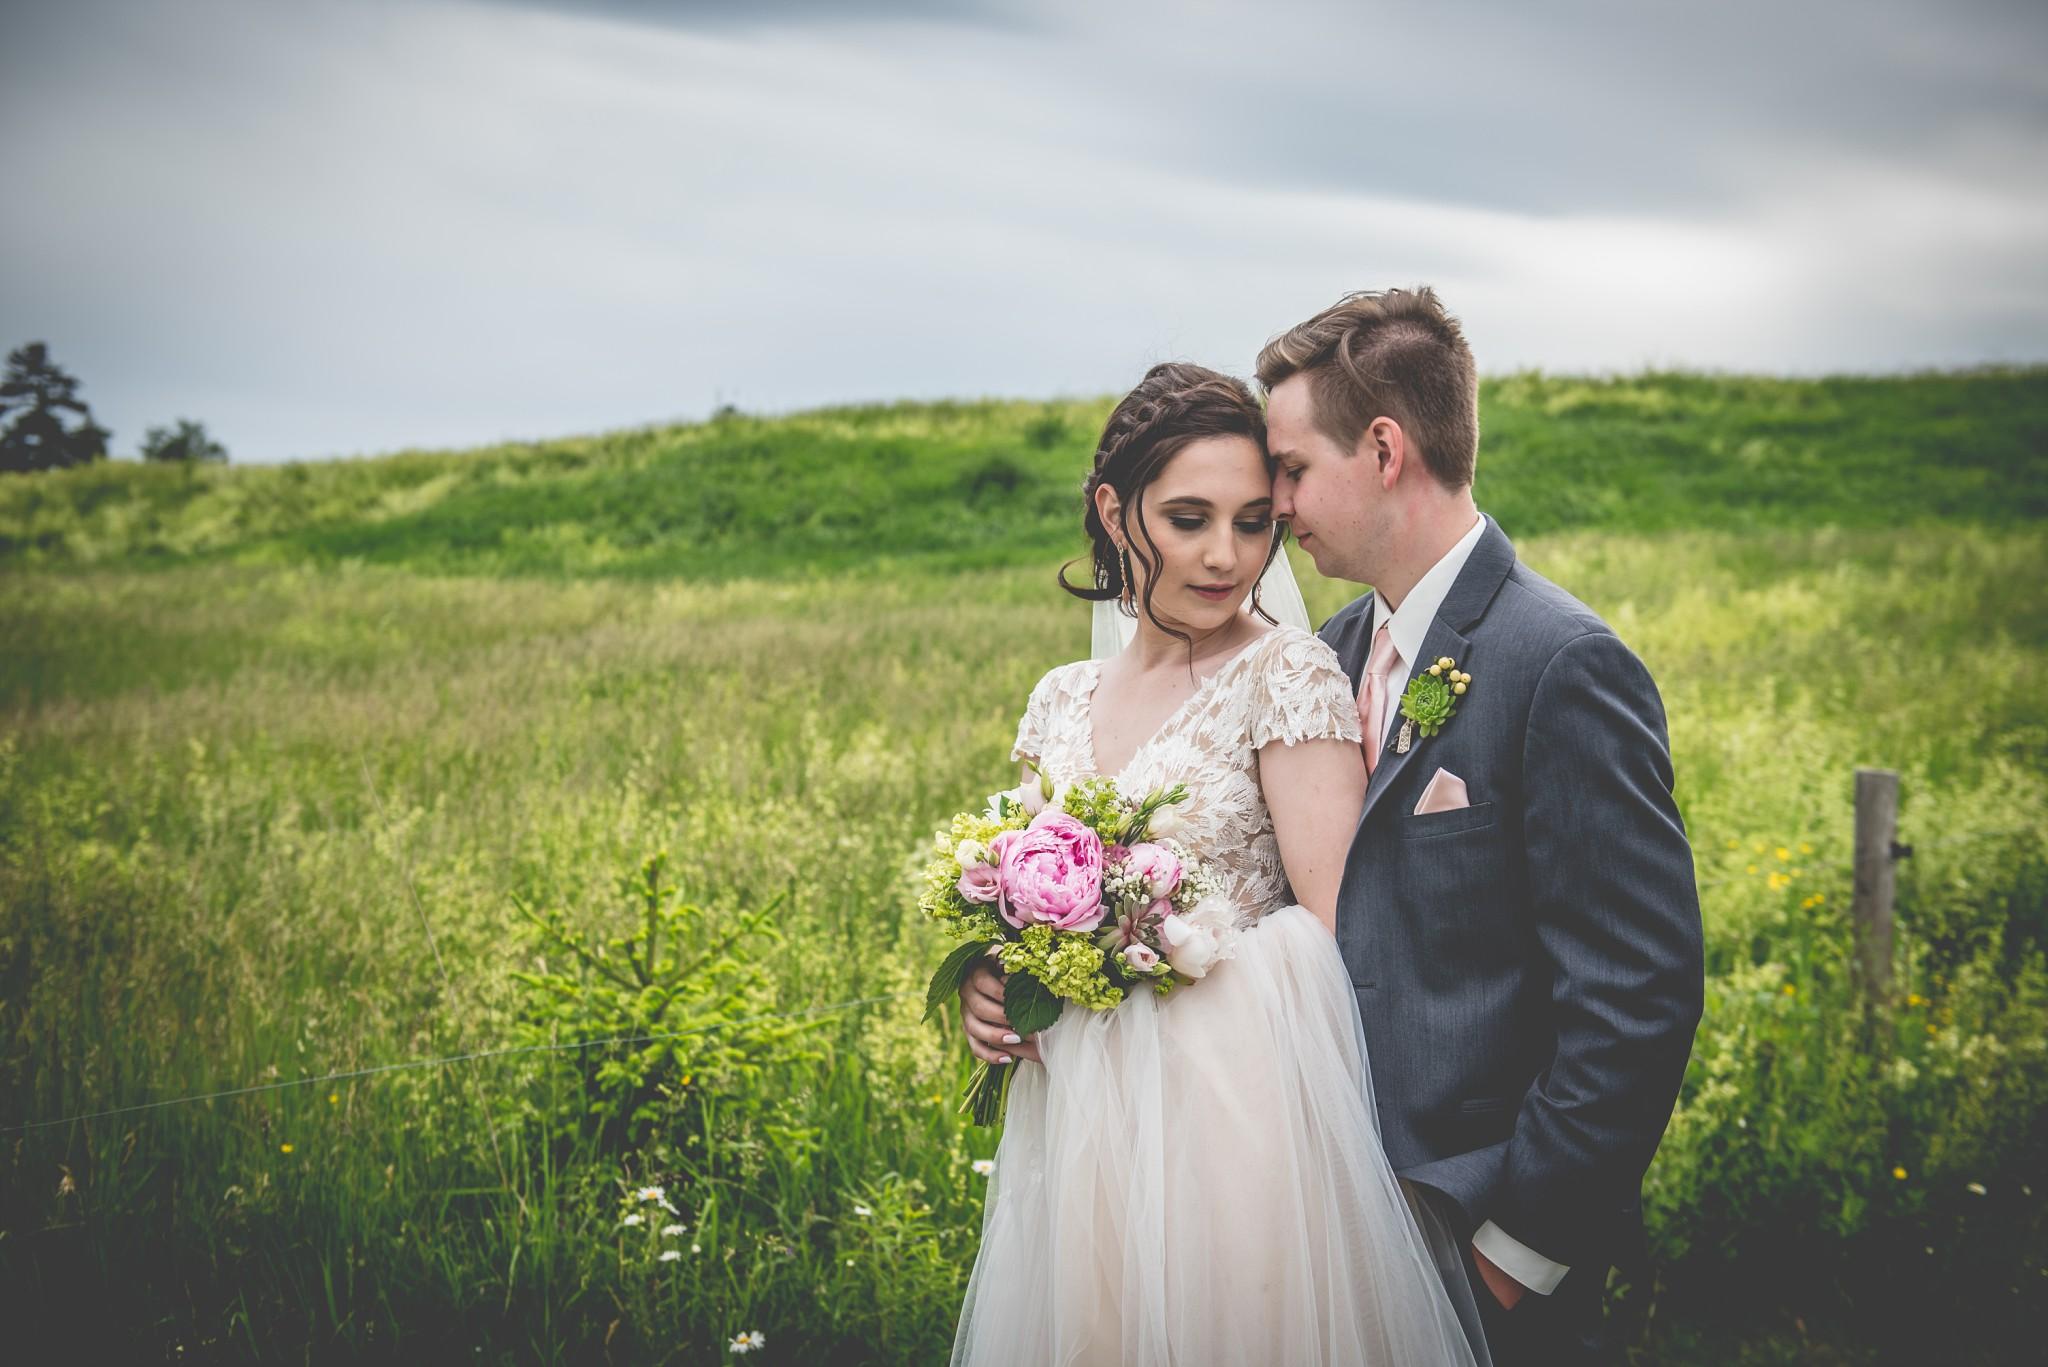 Liz & Isaac : Kelly Hill Farm Wedding